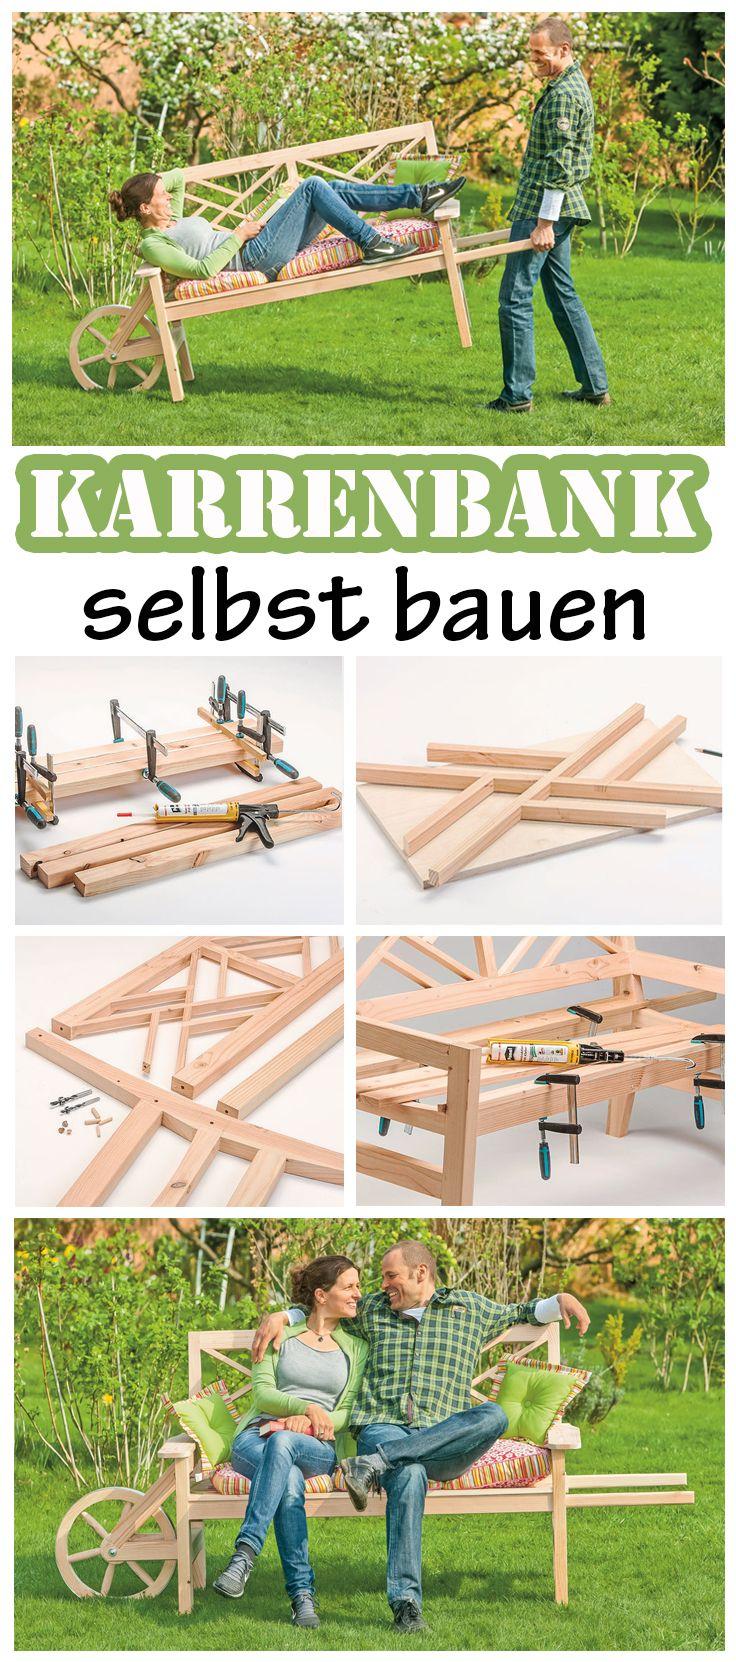 Bauplan: Schubkarrenbank | home | Pinterest | DIY furniture, Woods ...